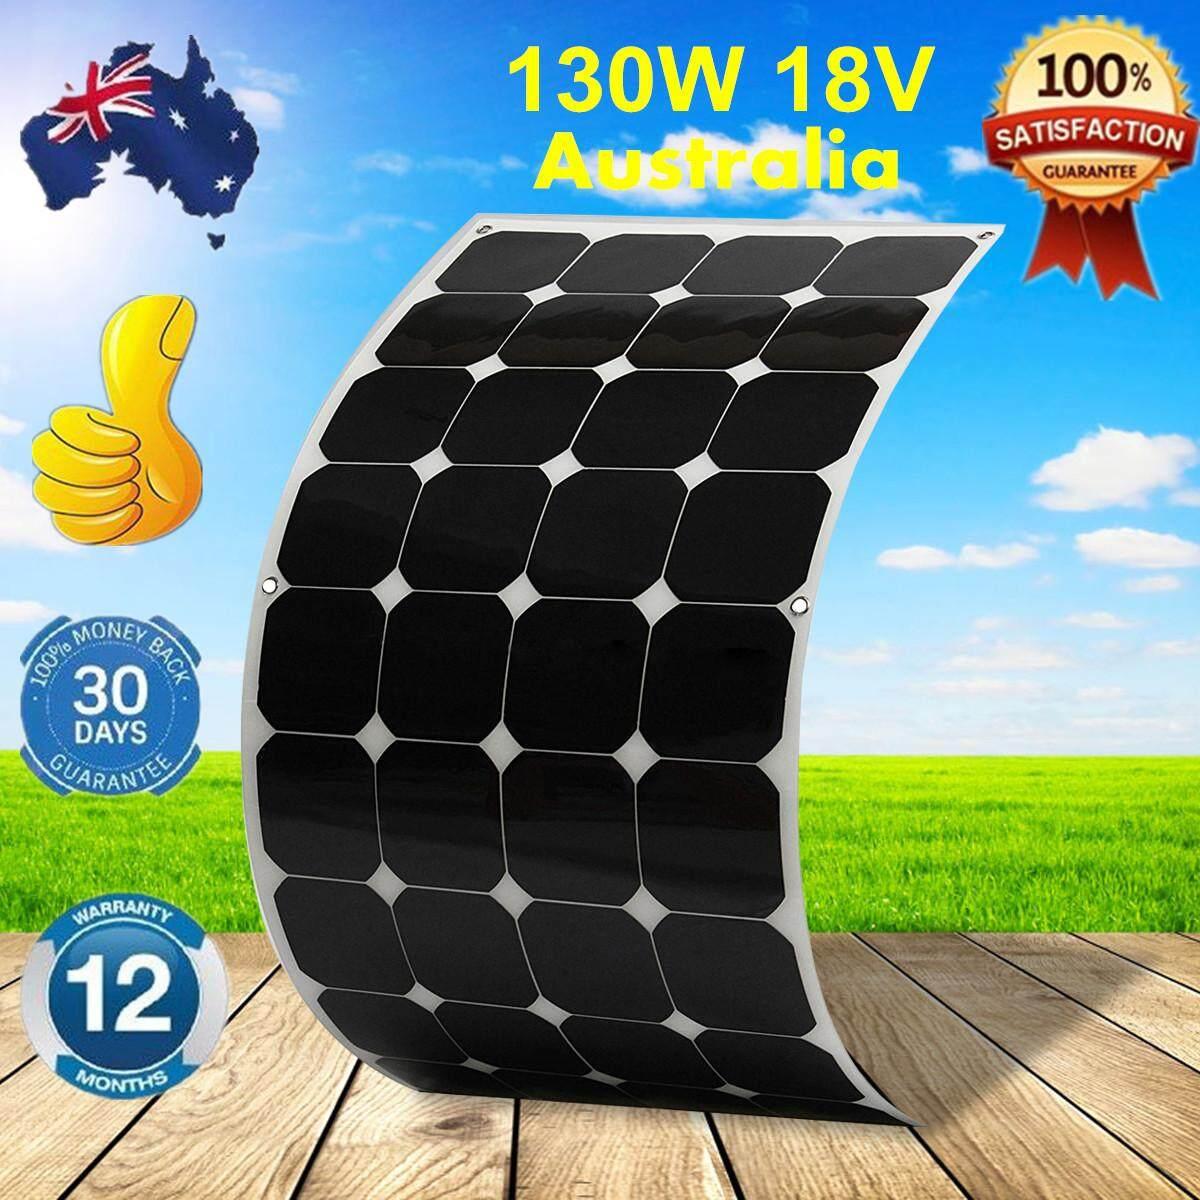 140 W 18 V Elfeland Sunpower-fleksibel Panel Surya Off Grid untuk Mobil RV-